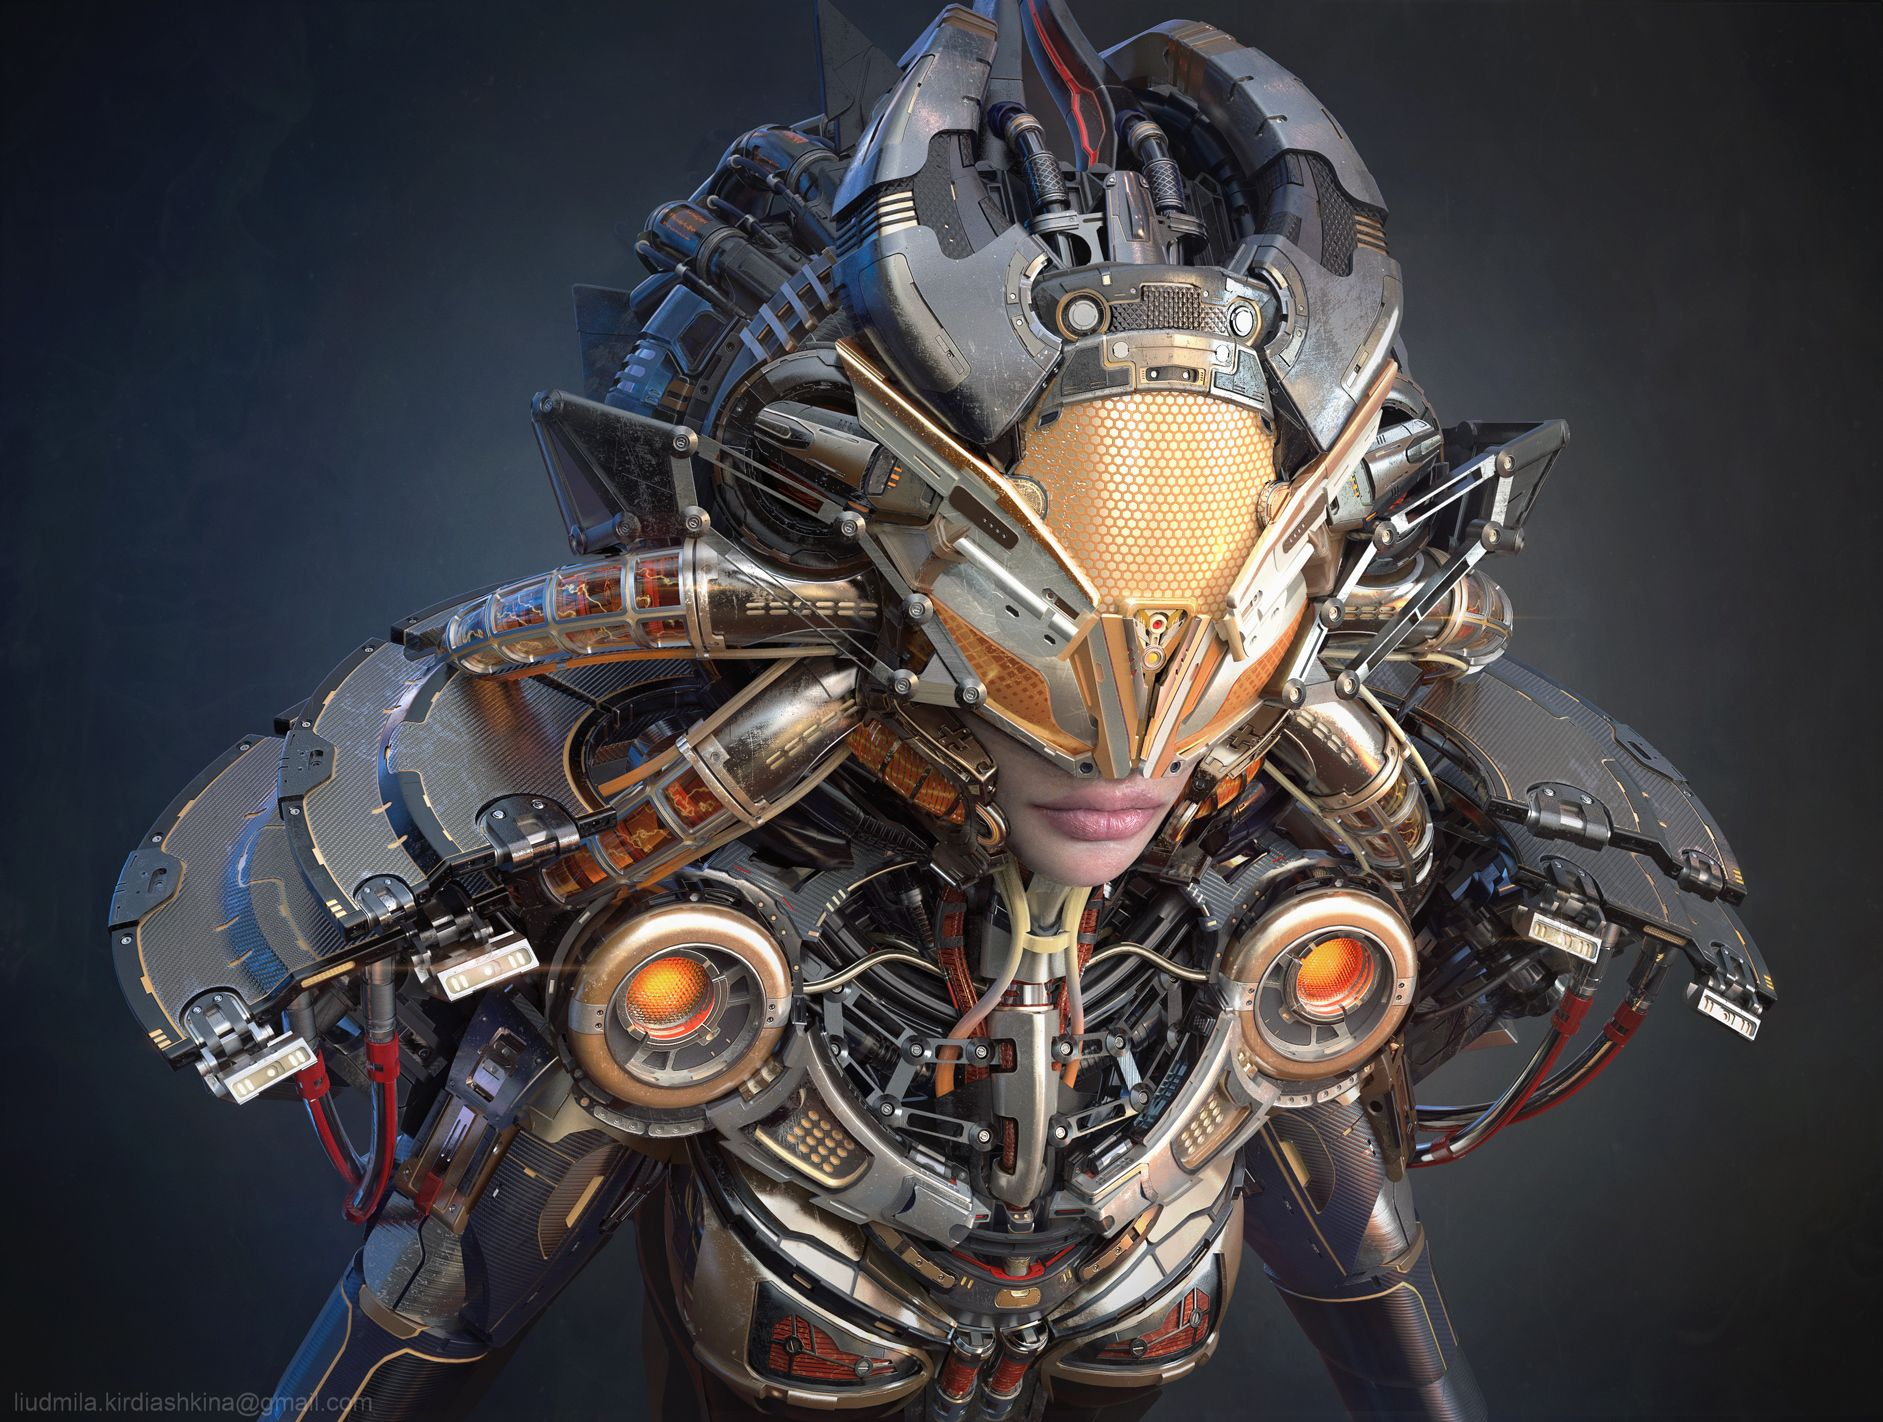 Hawk suit by Liudmila Kirdiashkina   Robotic/Cyborg   3D   CGSociety